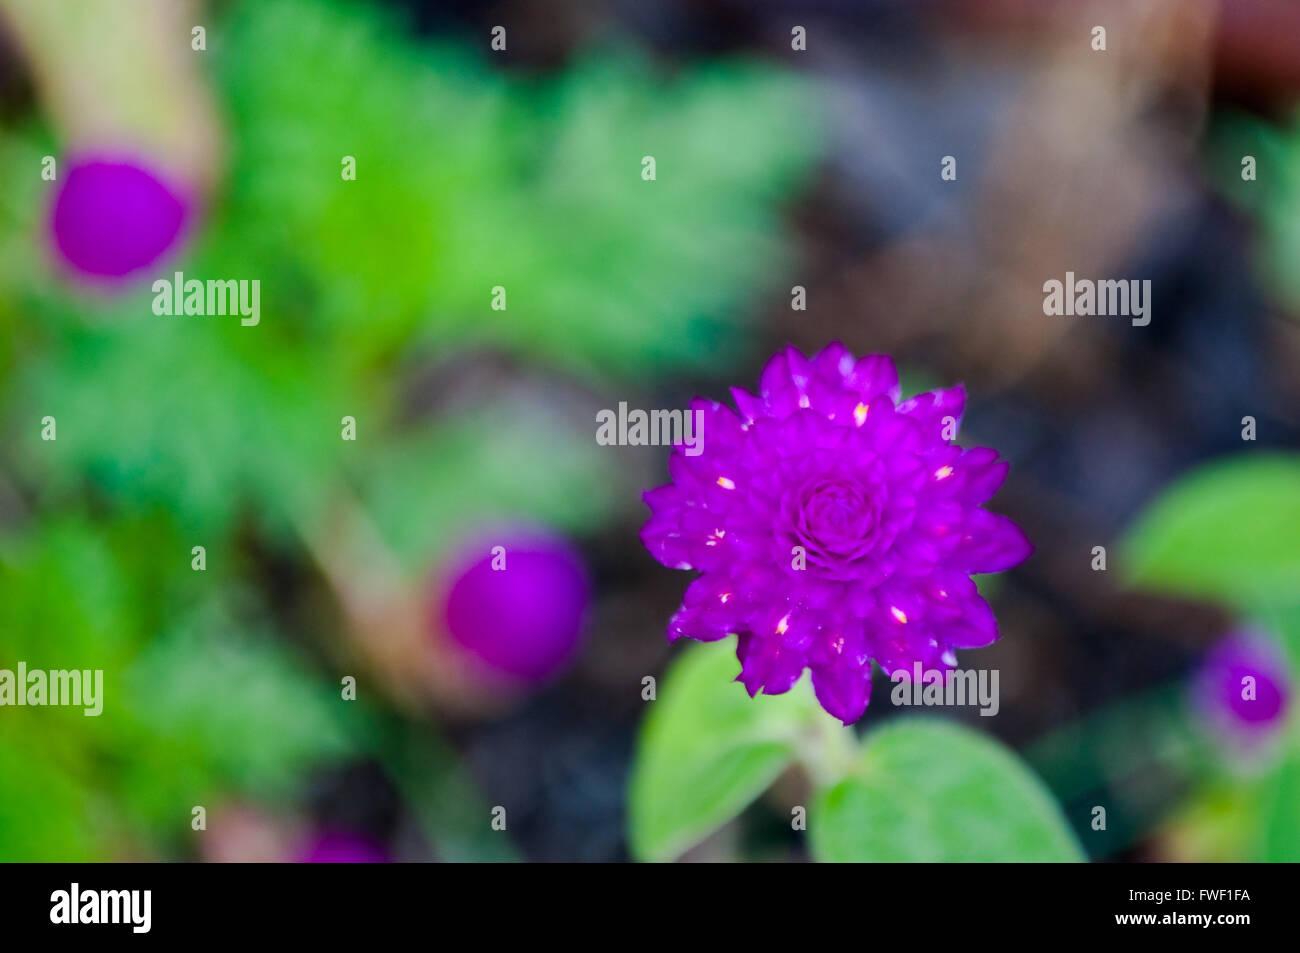 Violette Globus Amaranth (Gomphrena Globosa)-Blume-Draufsicht Stockfoto